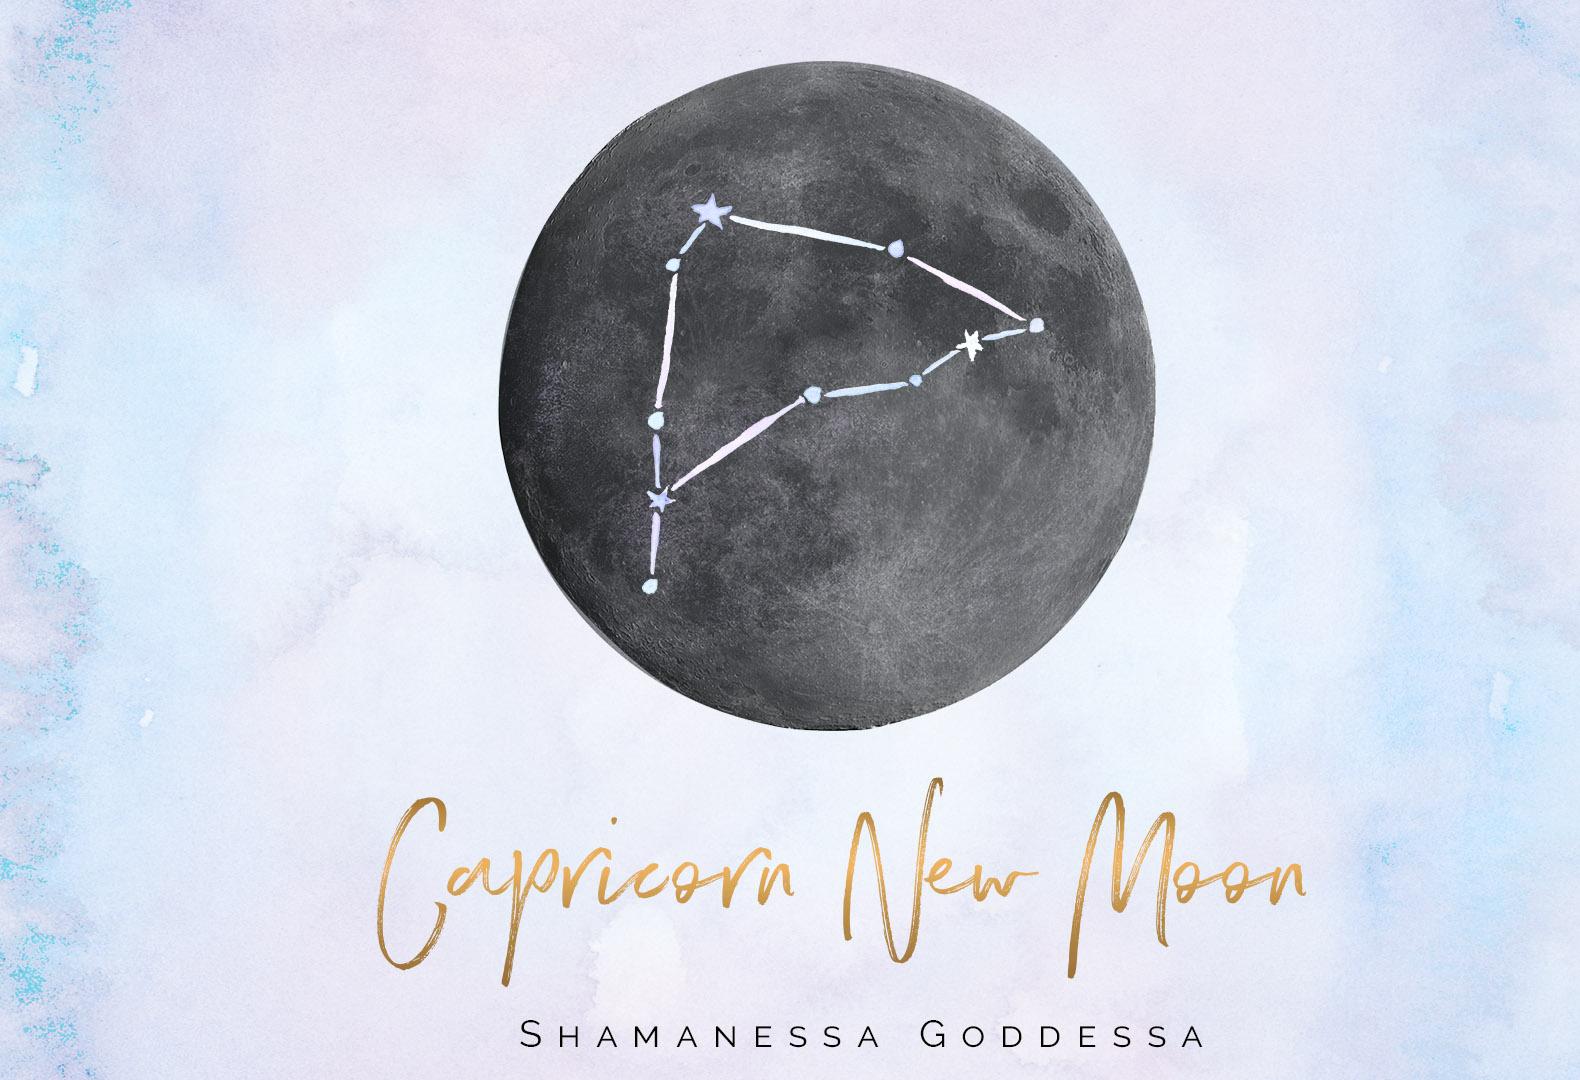 Capricorn New Moon.jpg